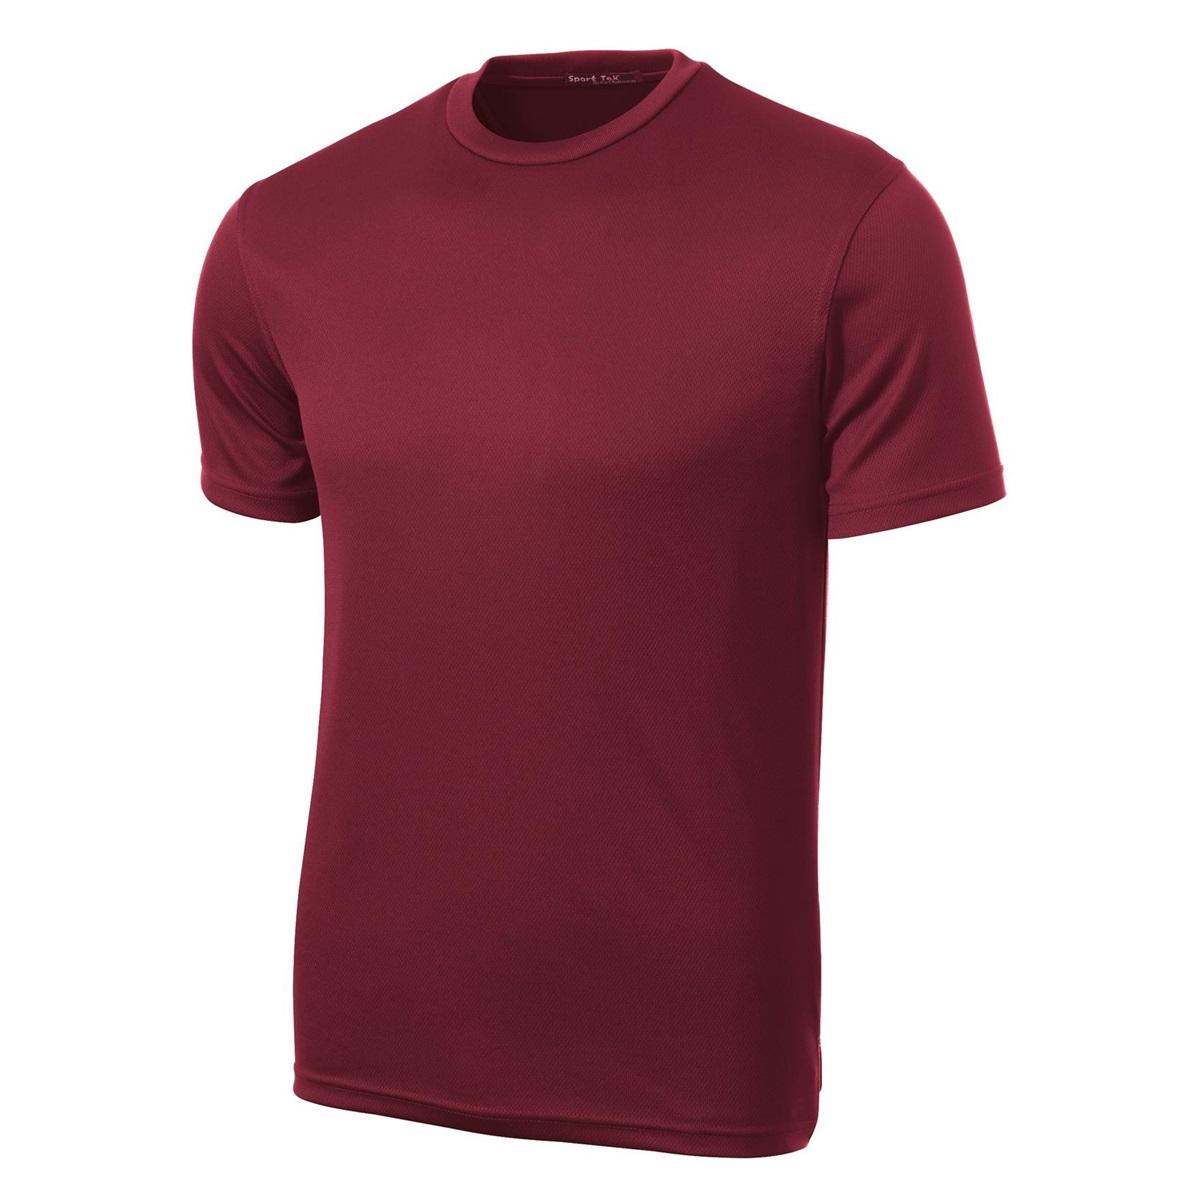 Sport tek k468 dri mesh short sleeve t shirt maroon for Maroon dri fit polo shirt